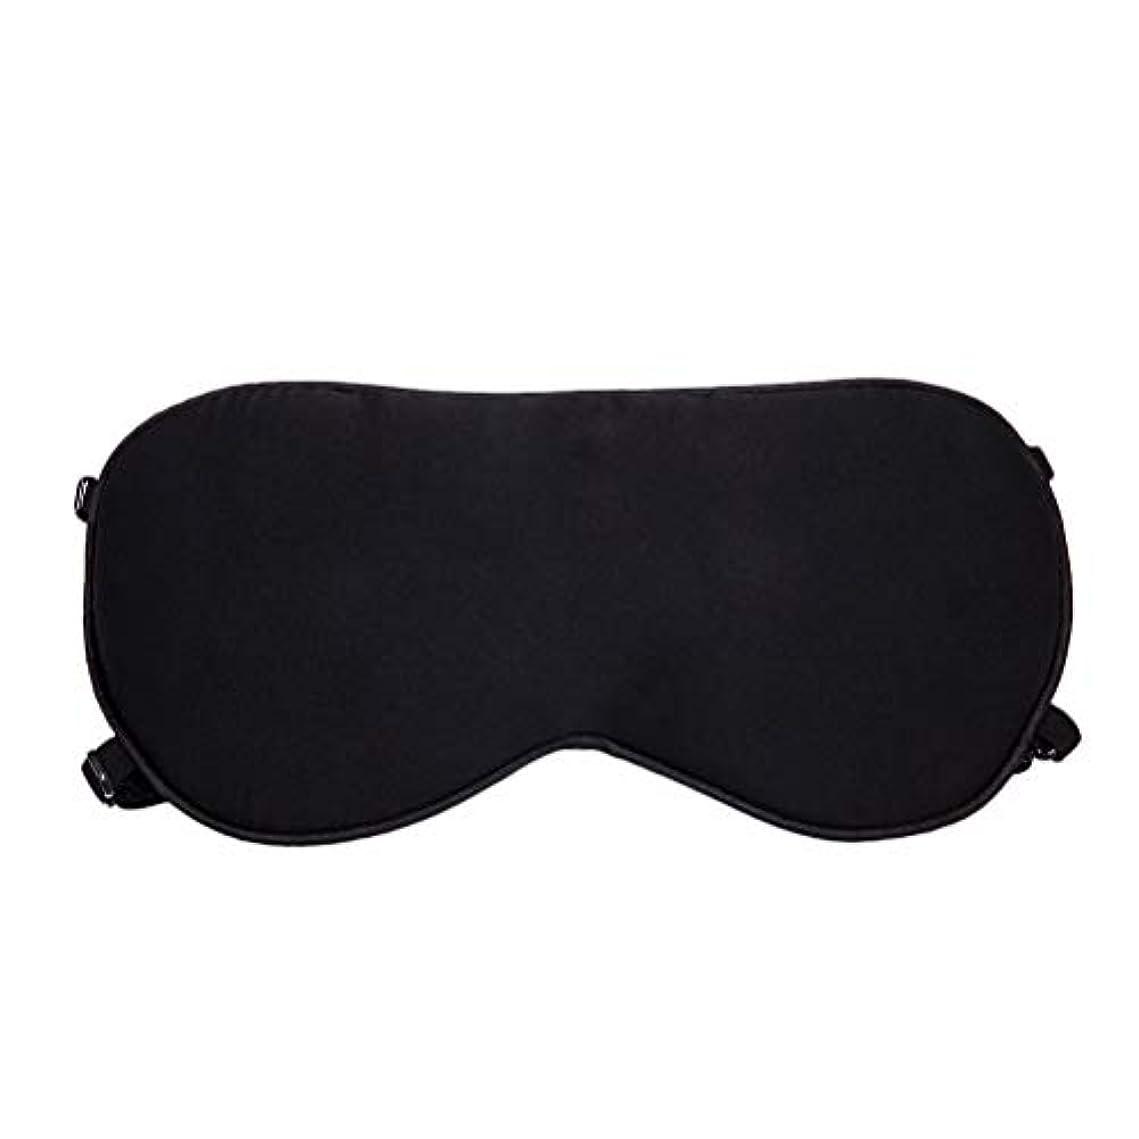 Healifty シルクスリーピングマスクブラインドパッチアイシェード目隠し用睡眠仮眠瞑想黒